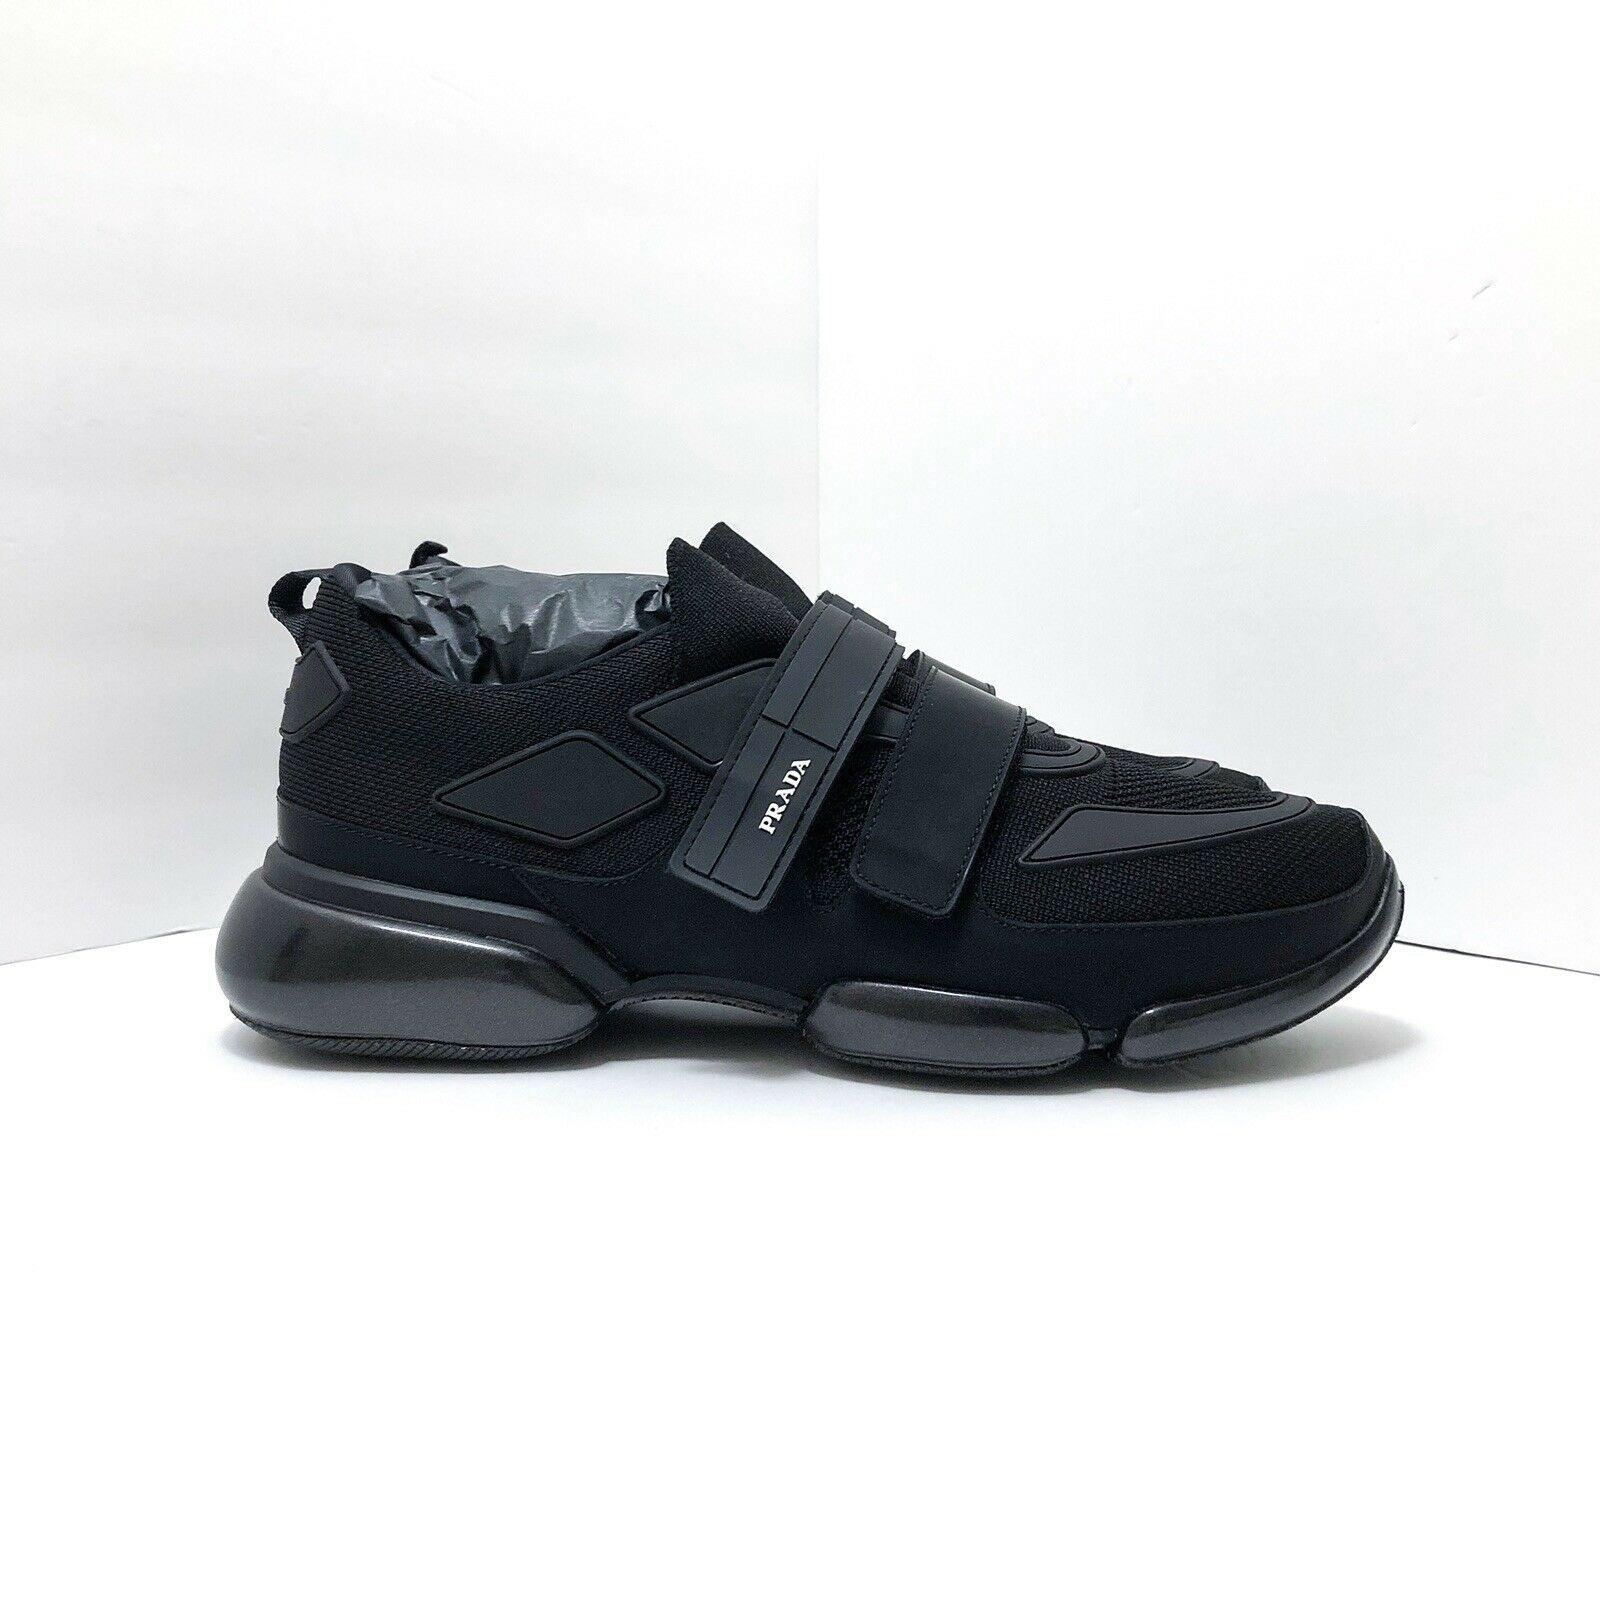 Prada Cloudbust Black For Sale - Kicks